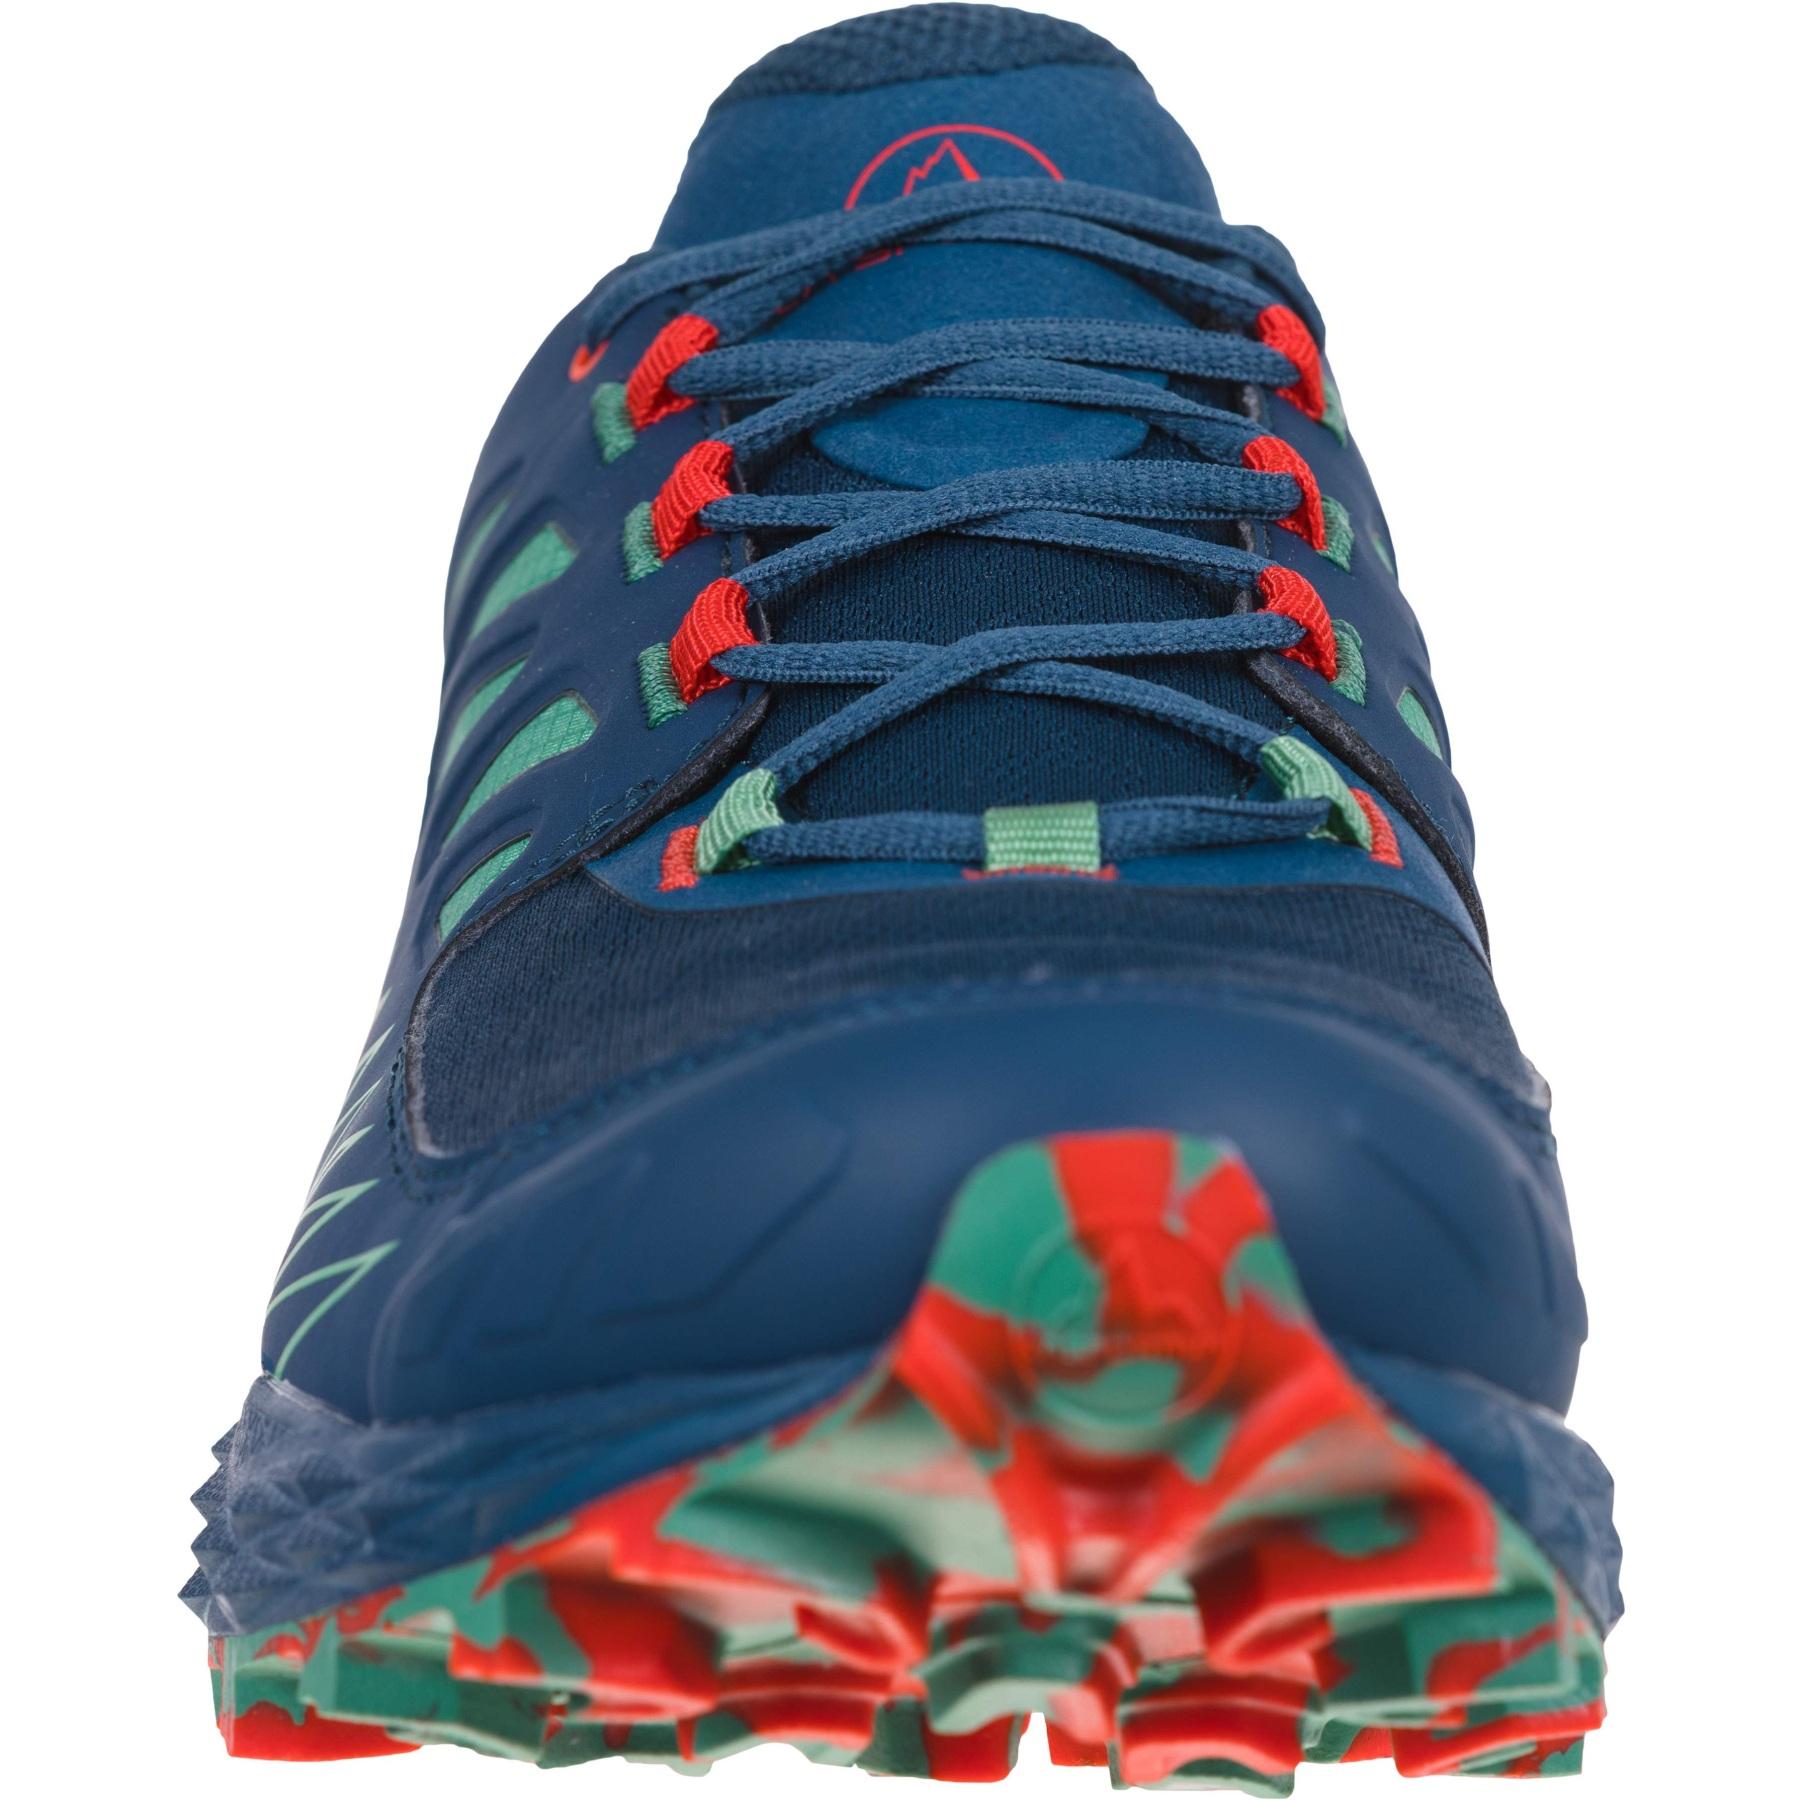 Image of La Sportiva Lycan GTX Running Shoes - Opal/Grass Green